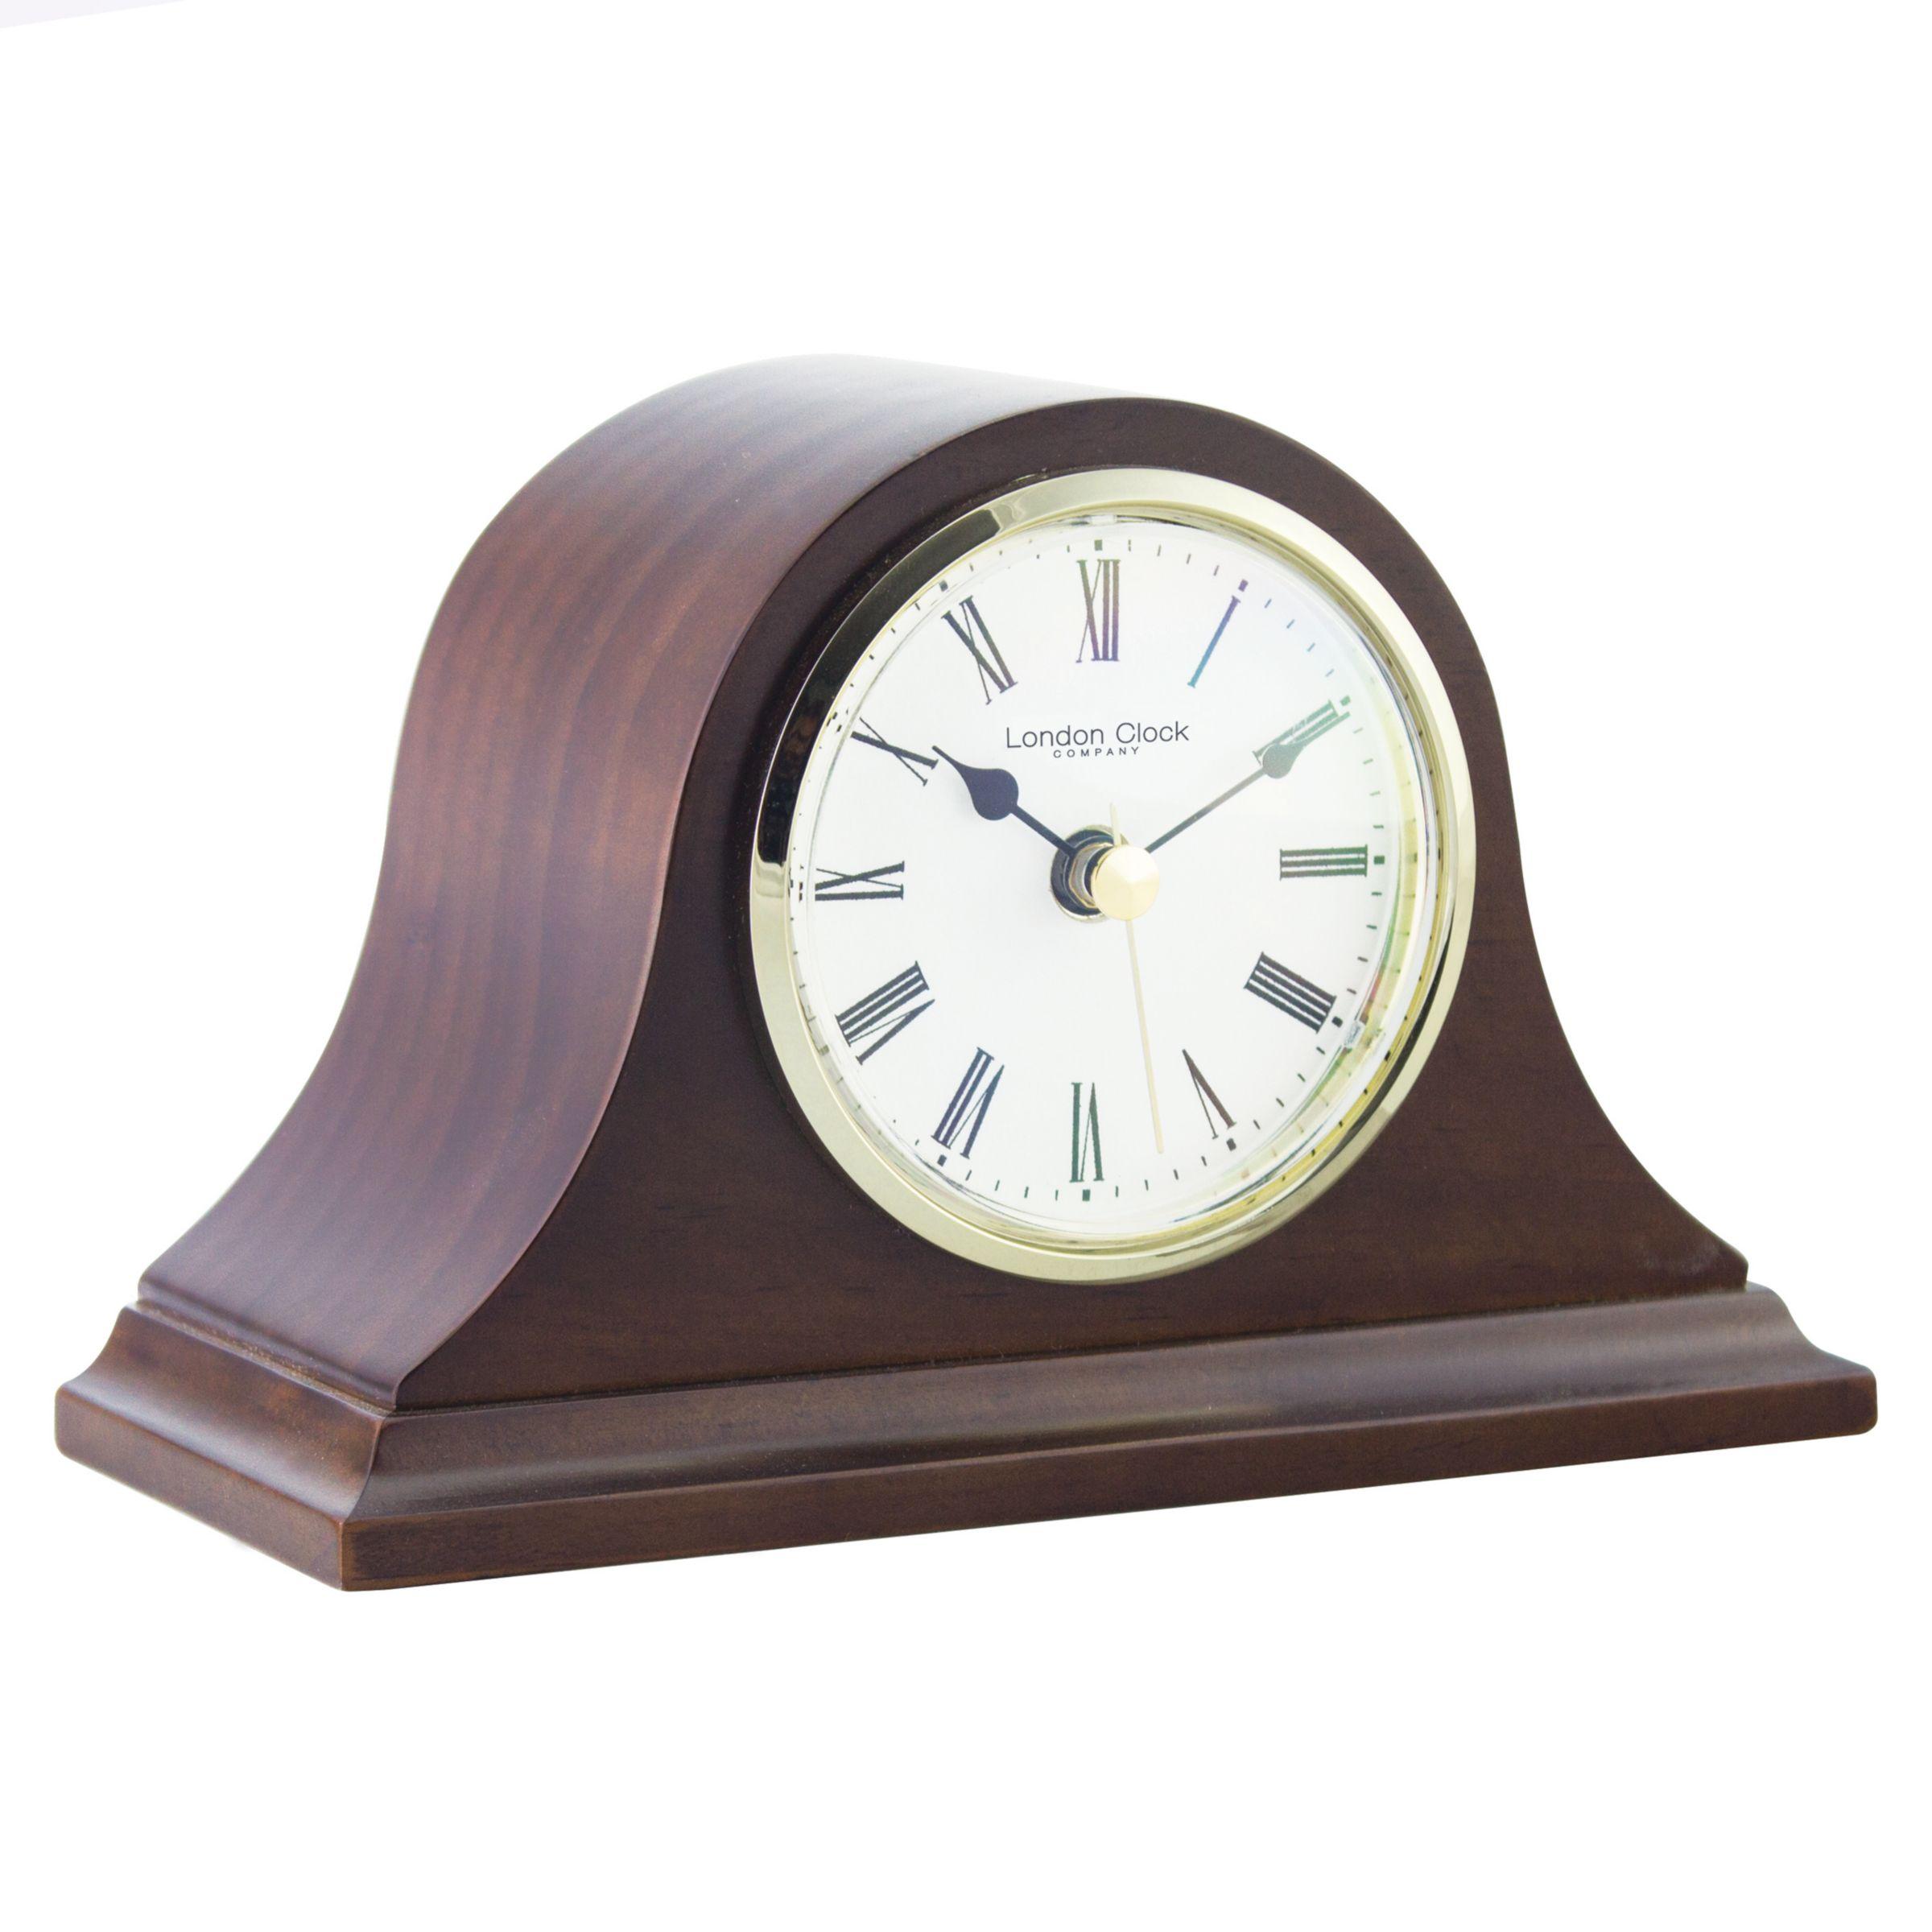 London Clock Company London Clock Company Solid Wood Mantel Clock, Small